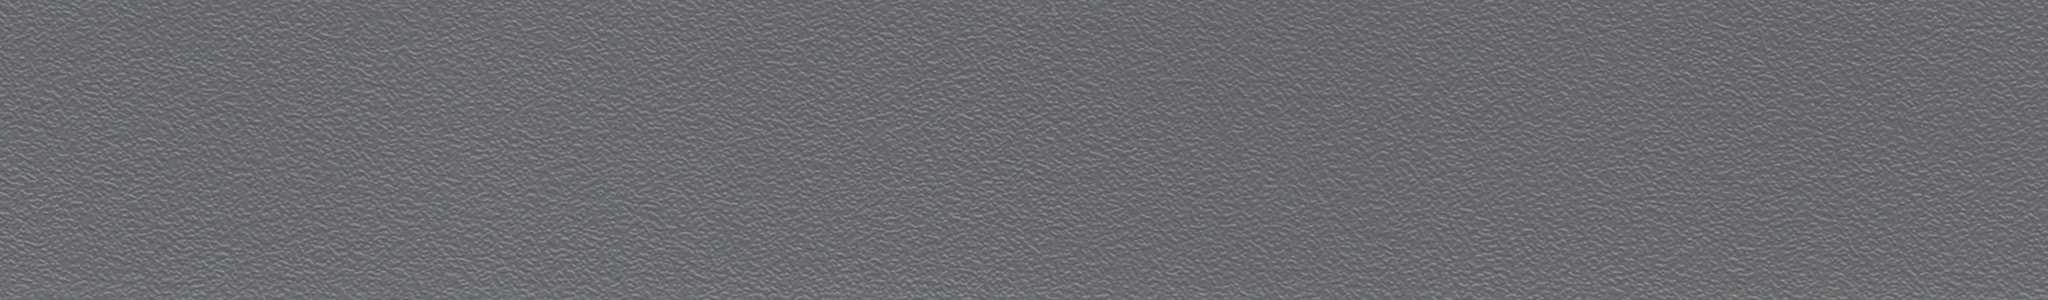 HU 17741 кромка ABS серая жемчуг XG